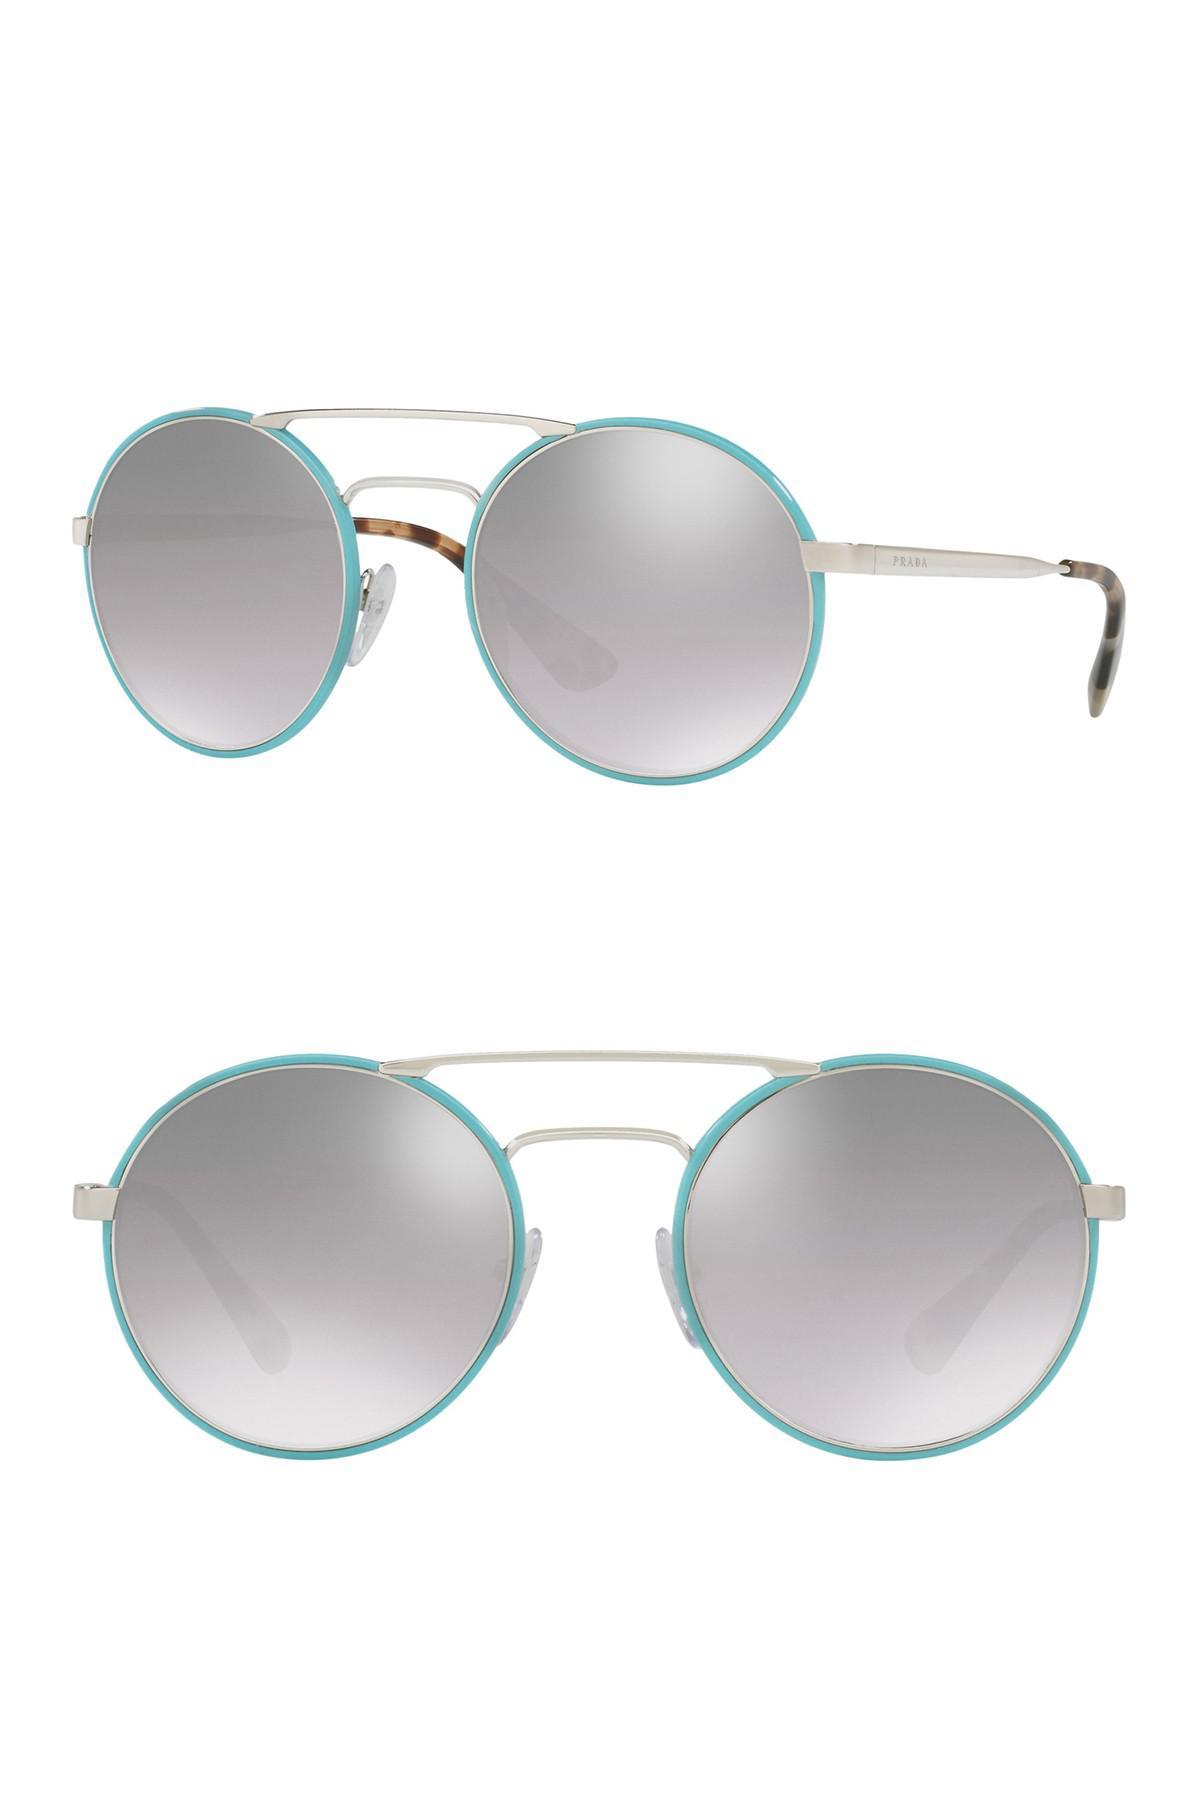 480861bb1a0 Prada. Women s 54mm Round Catwalk Sunglasses